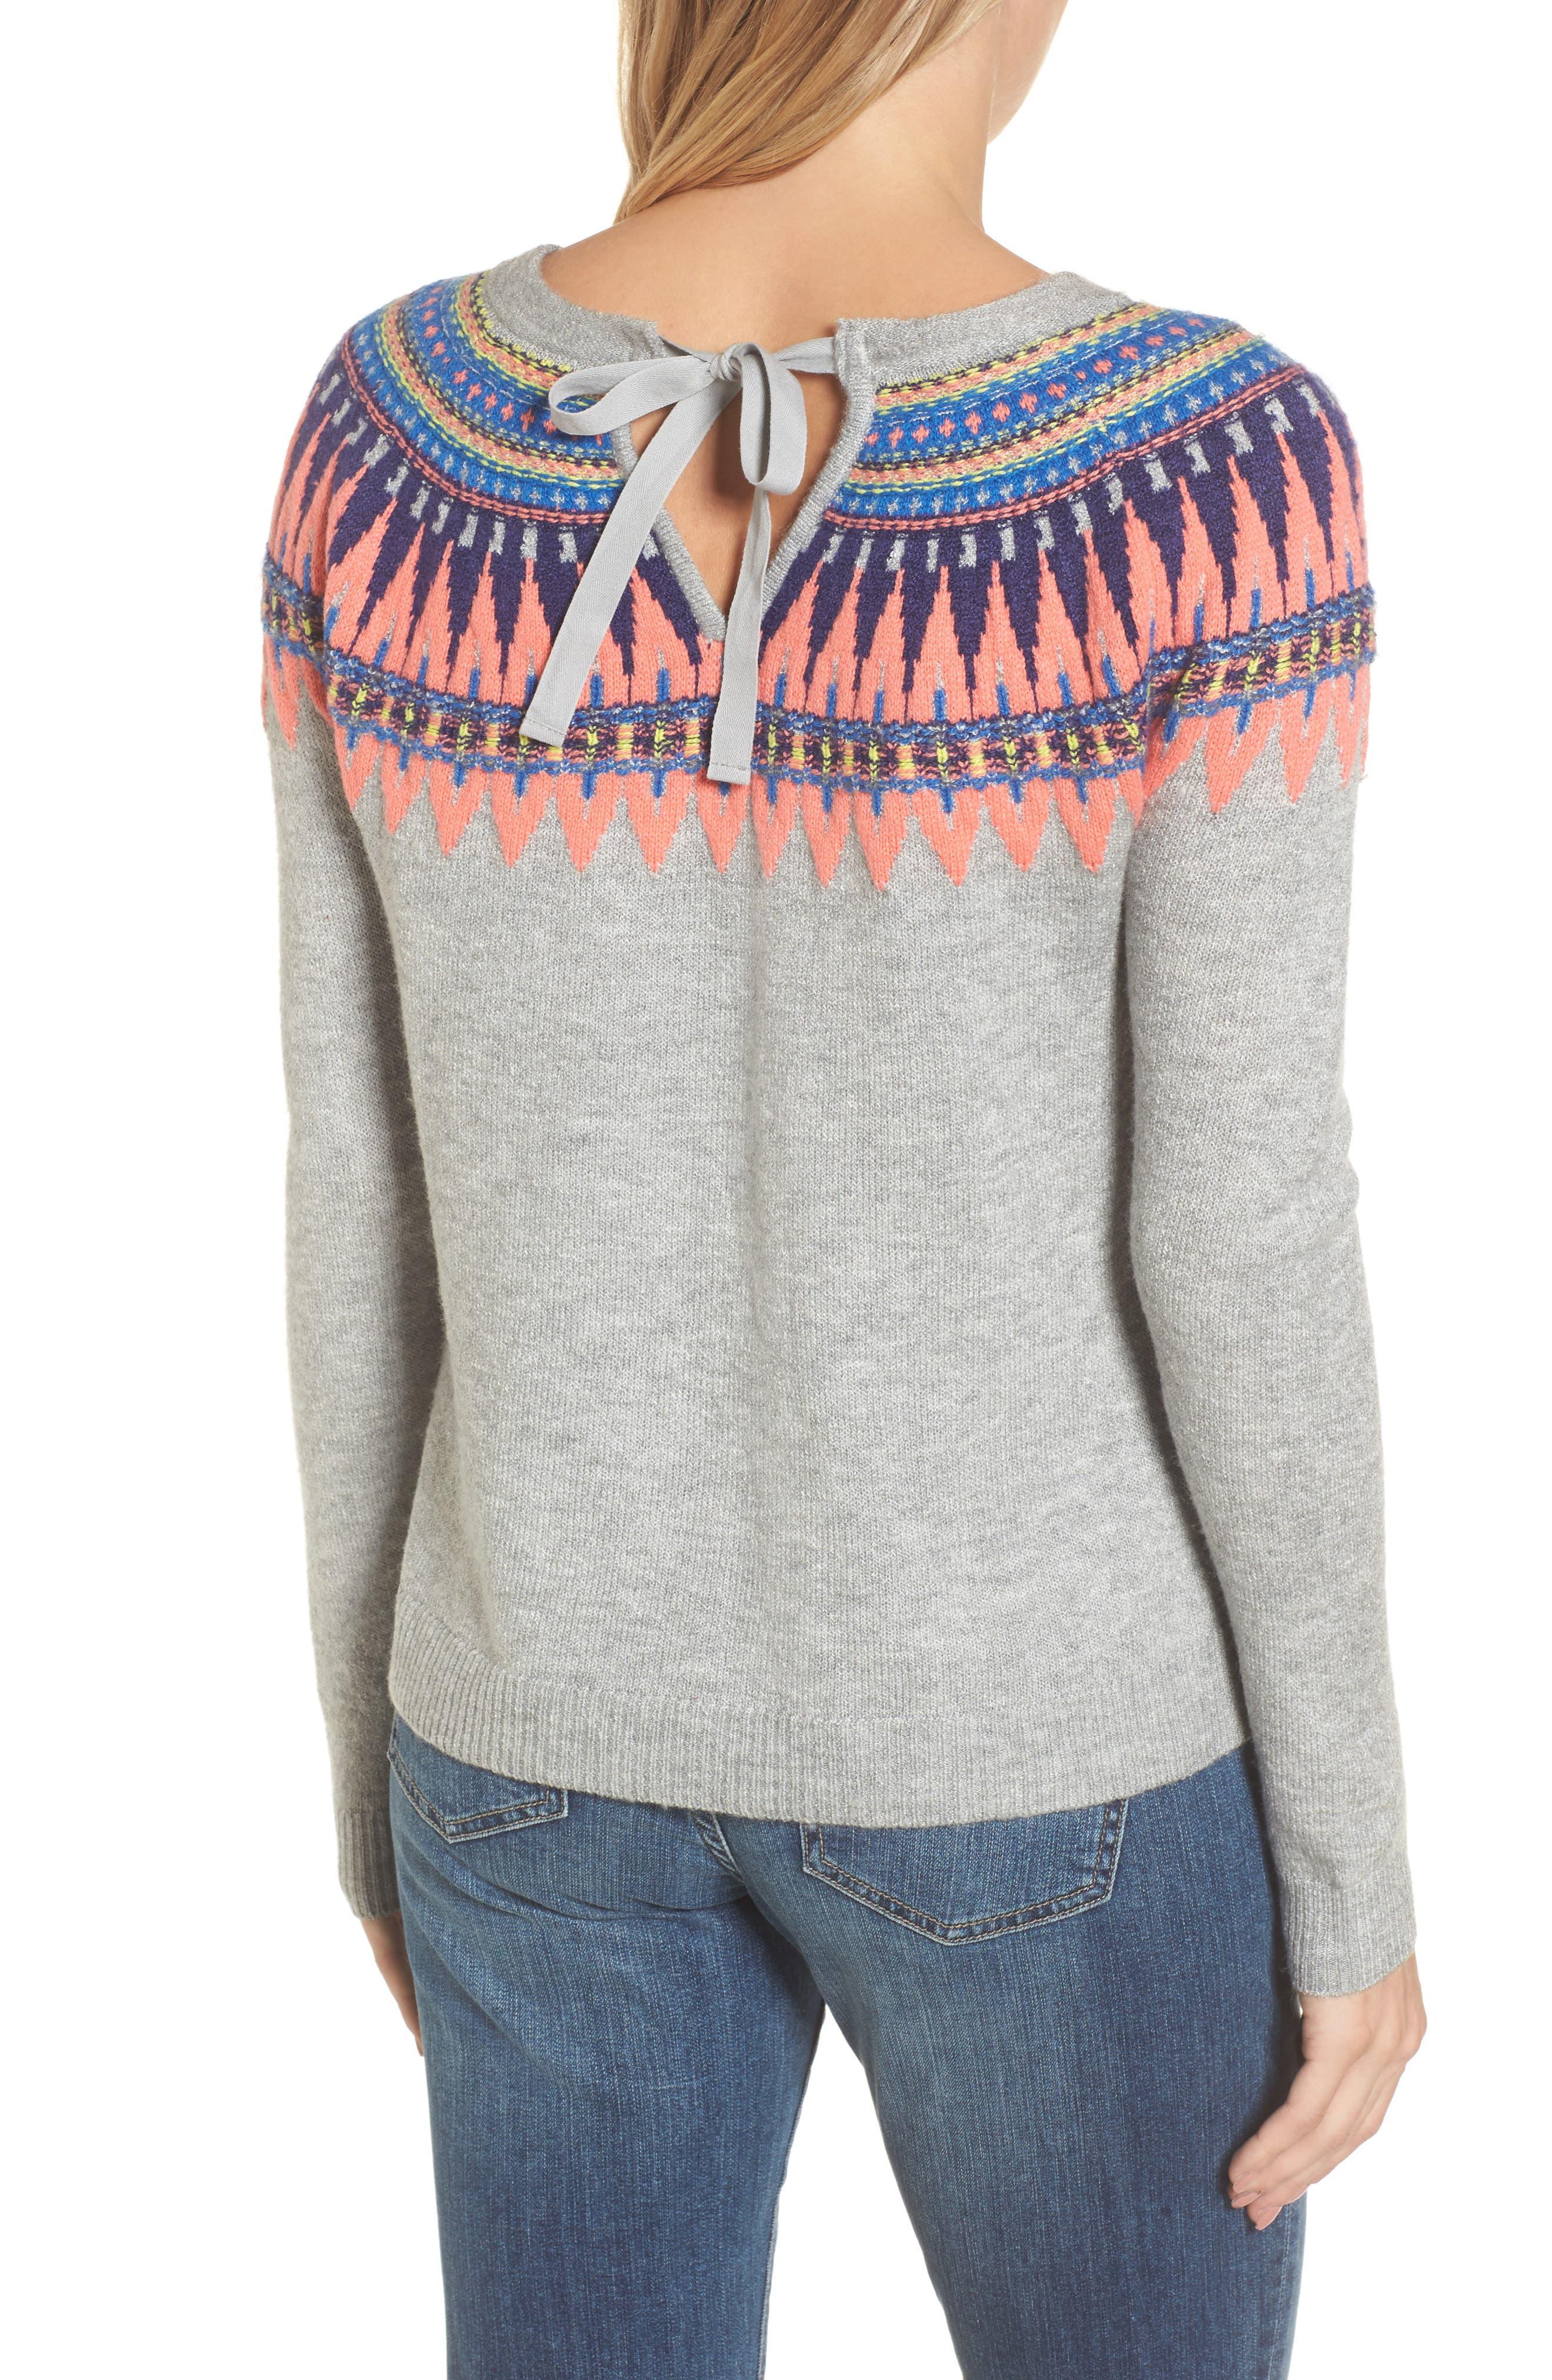 Alternate Image 3  - Caslon® Tie Back Patterned Sweater (Regular & Petite)